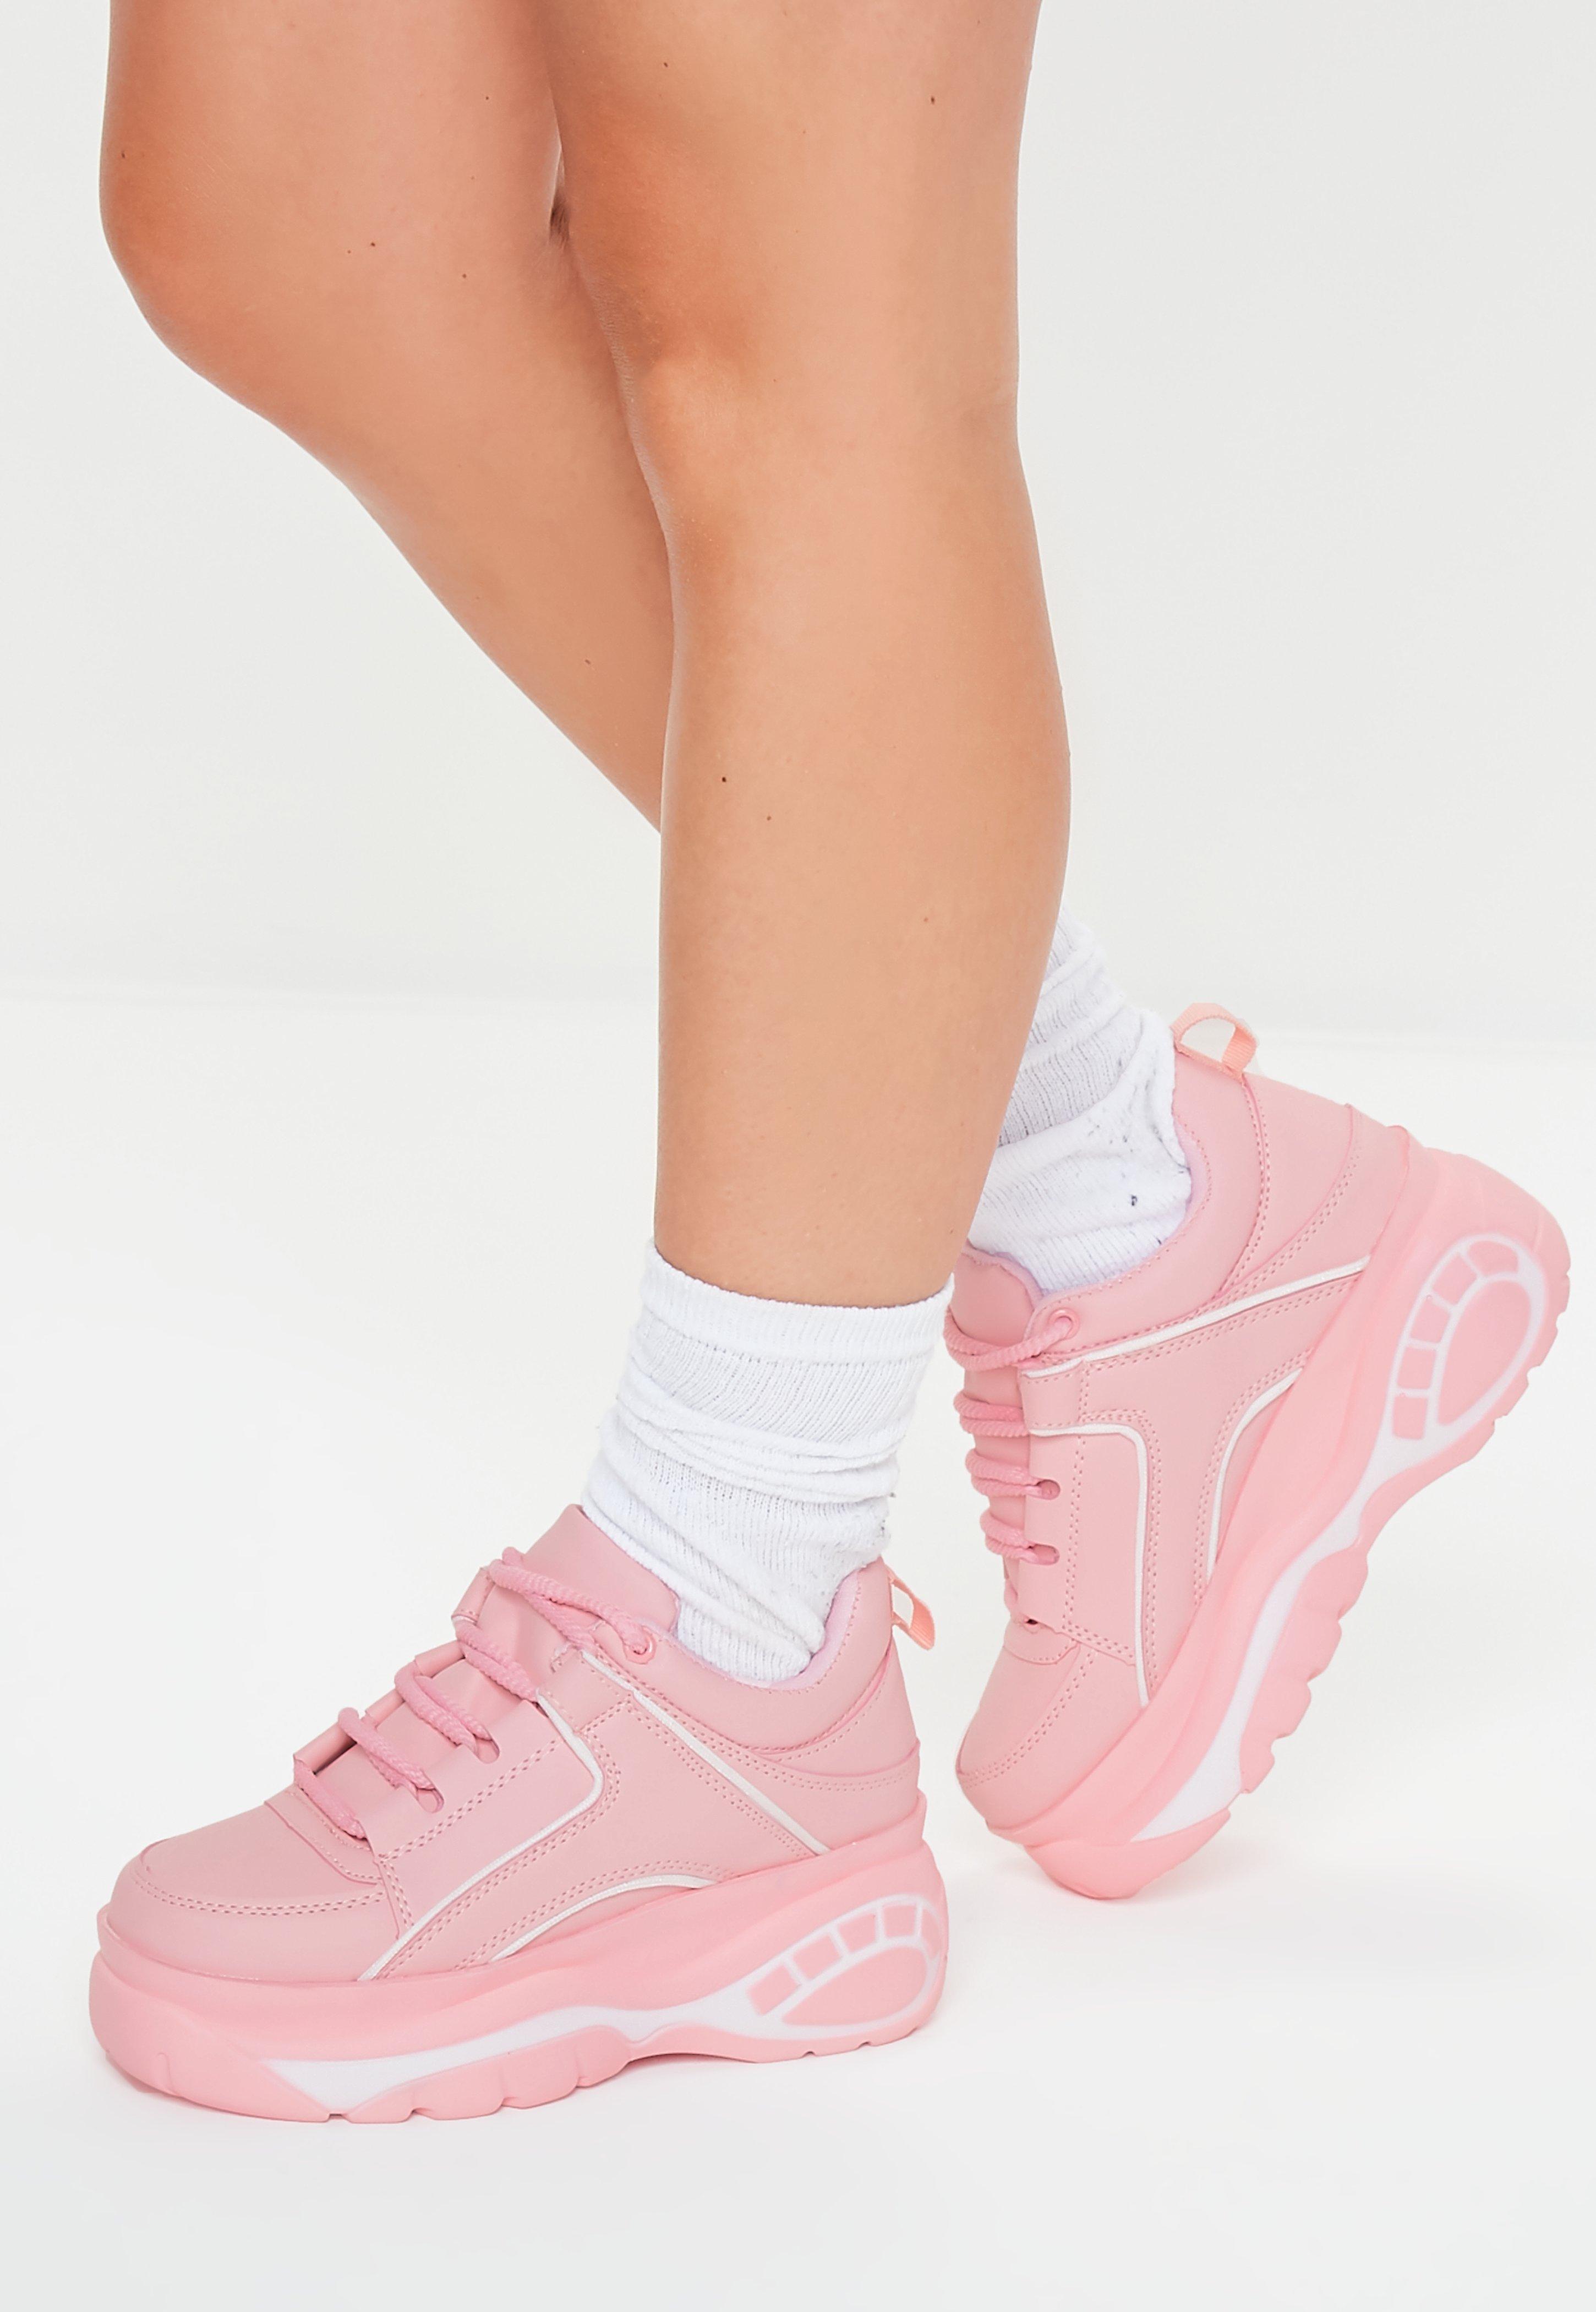 newest 87847 2d146 Shoes   Women s Footwear Online UK - Missguided